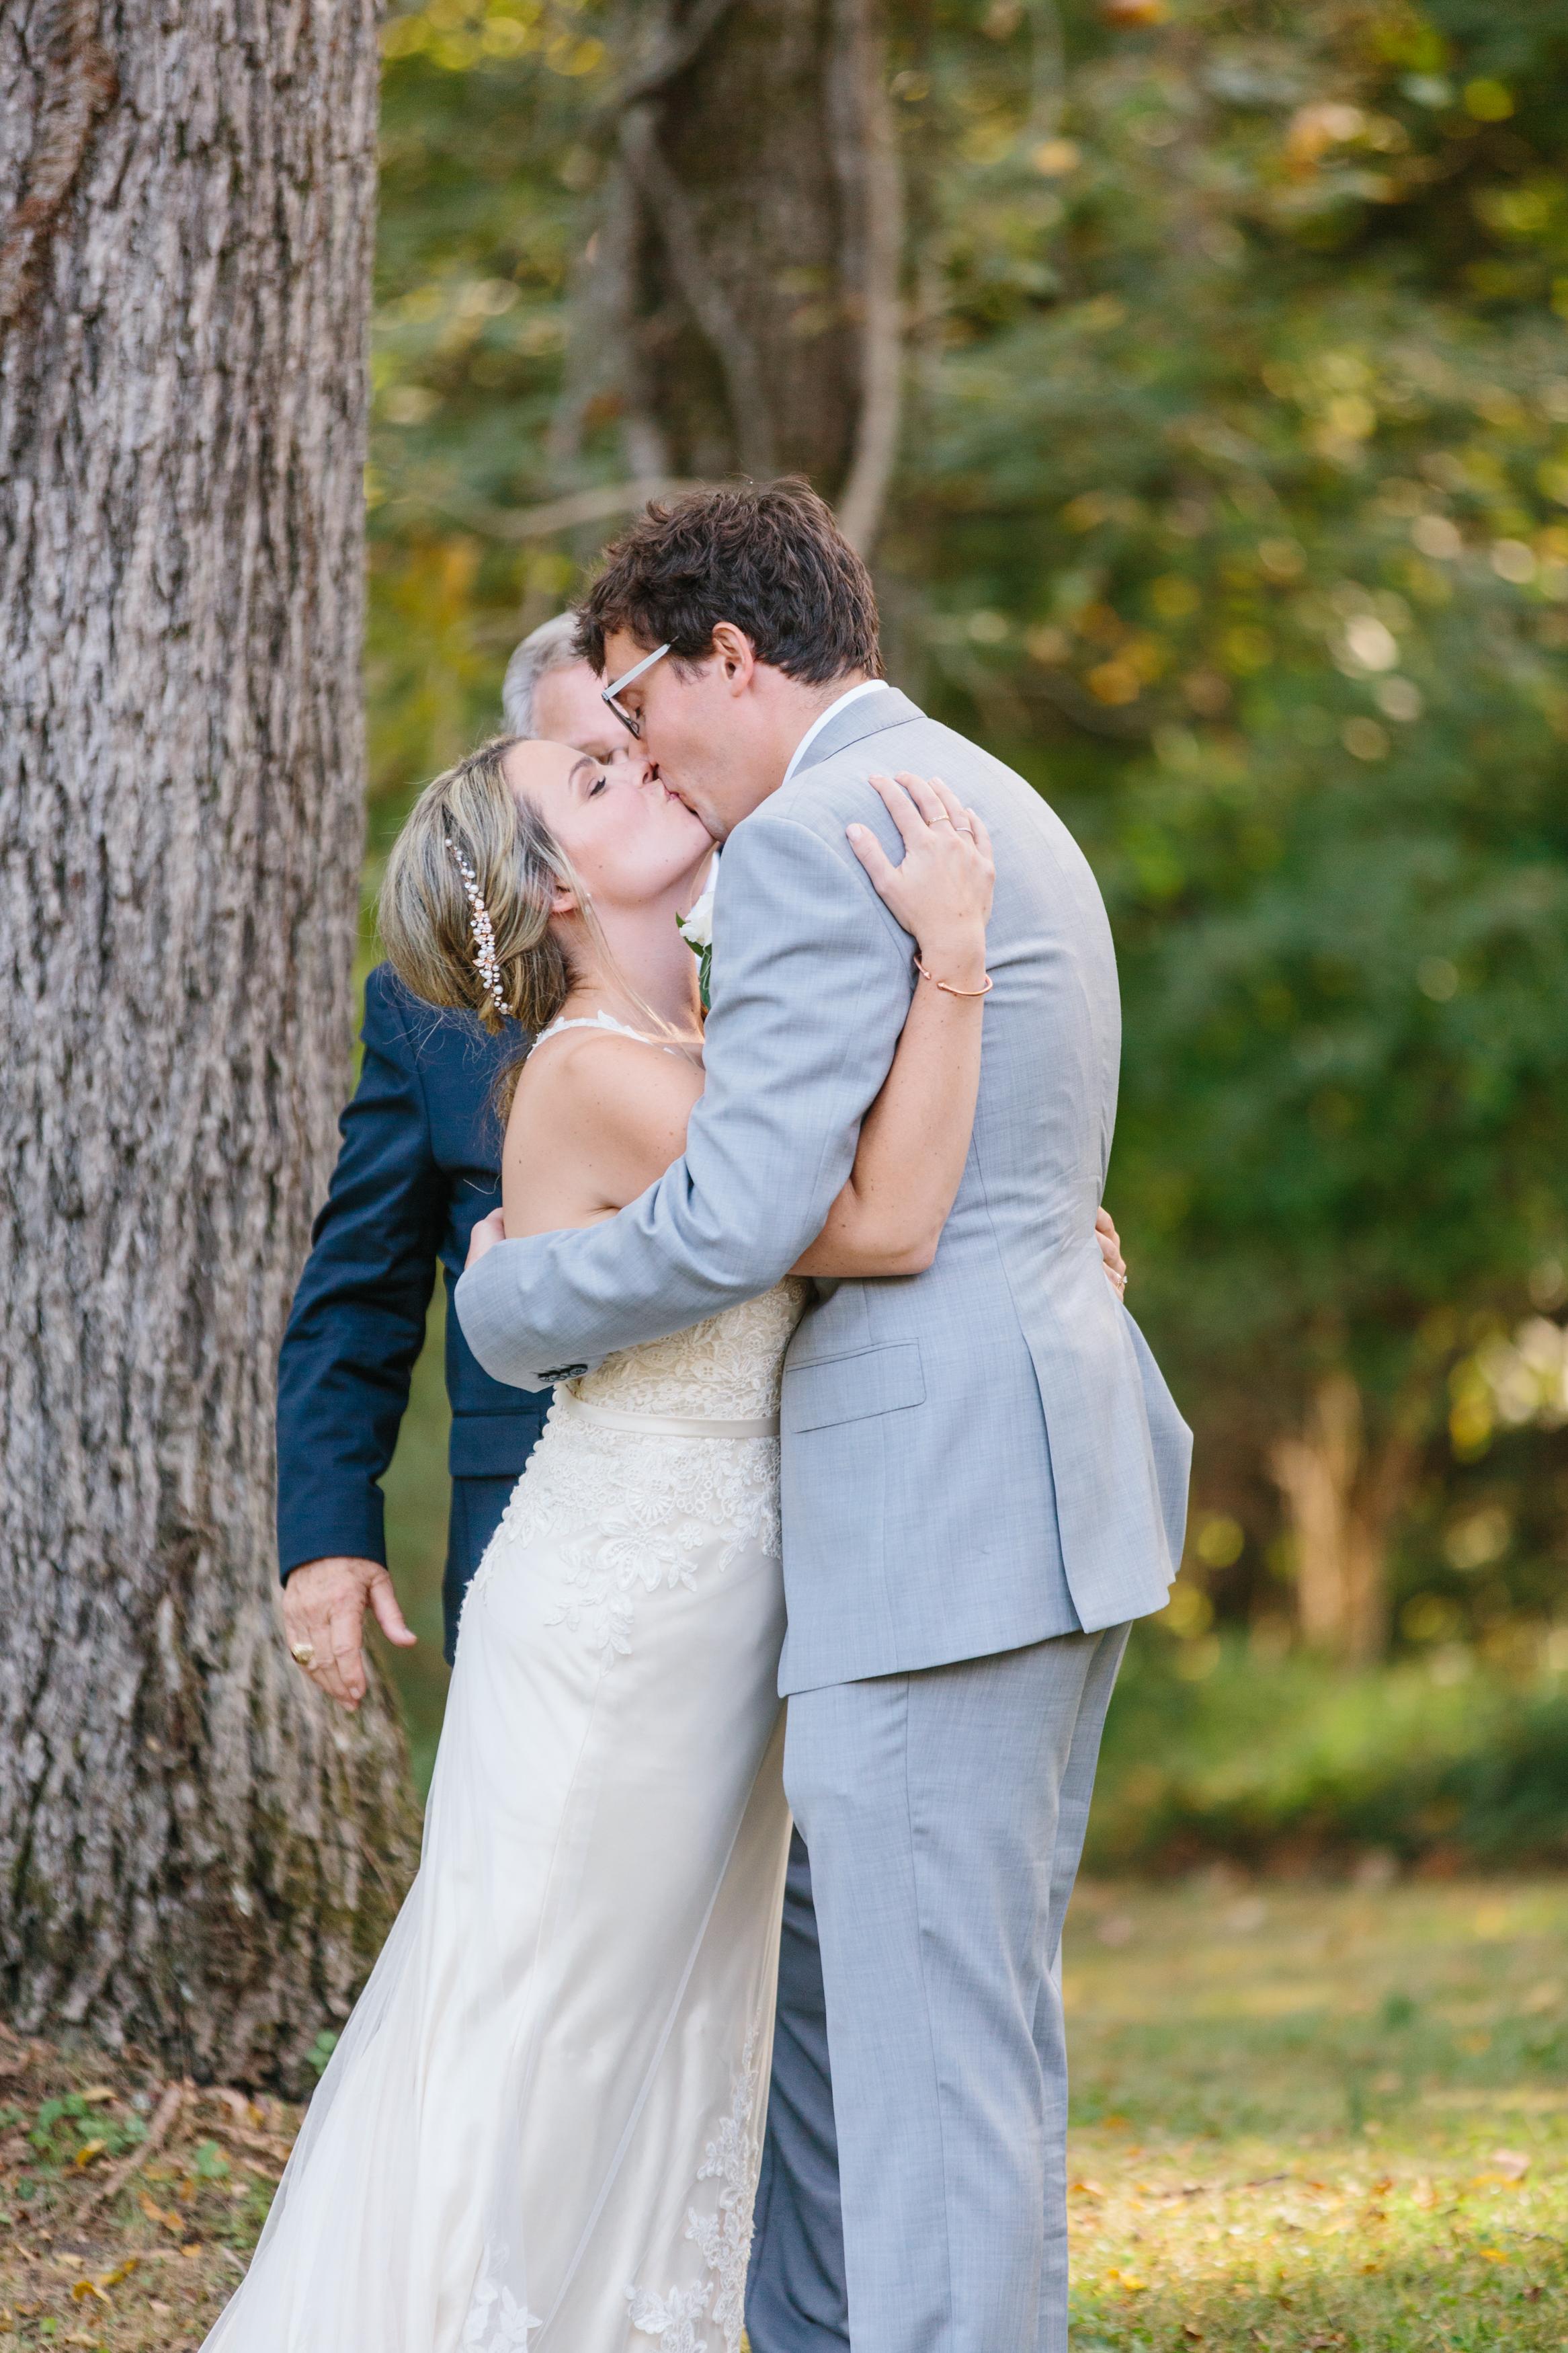 Abby_Simon_Wedding_Abigail_Malone_Photography_nashville_Bloomsbury_Farm-363.jpg